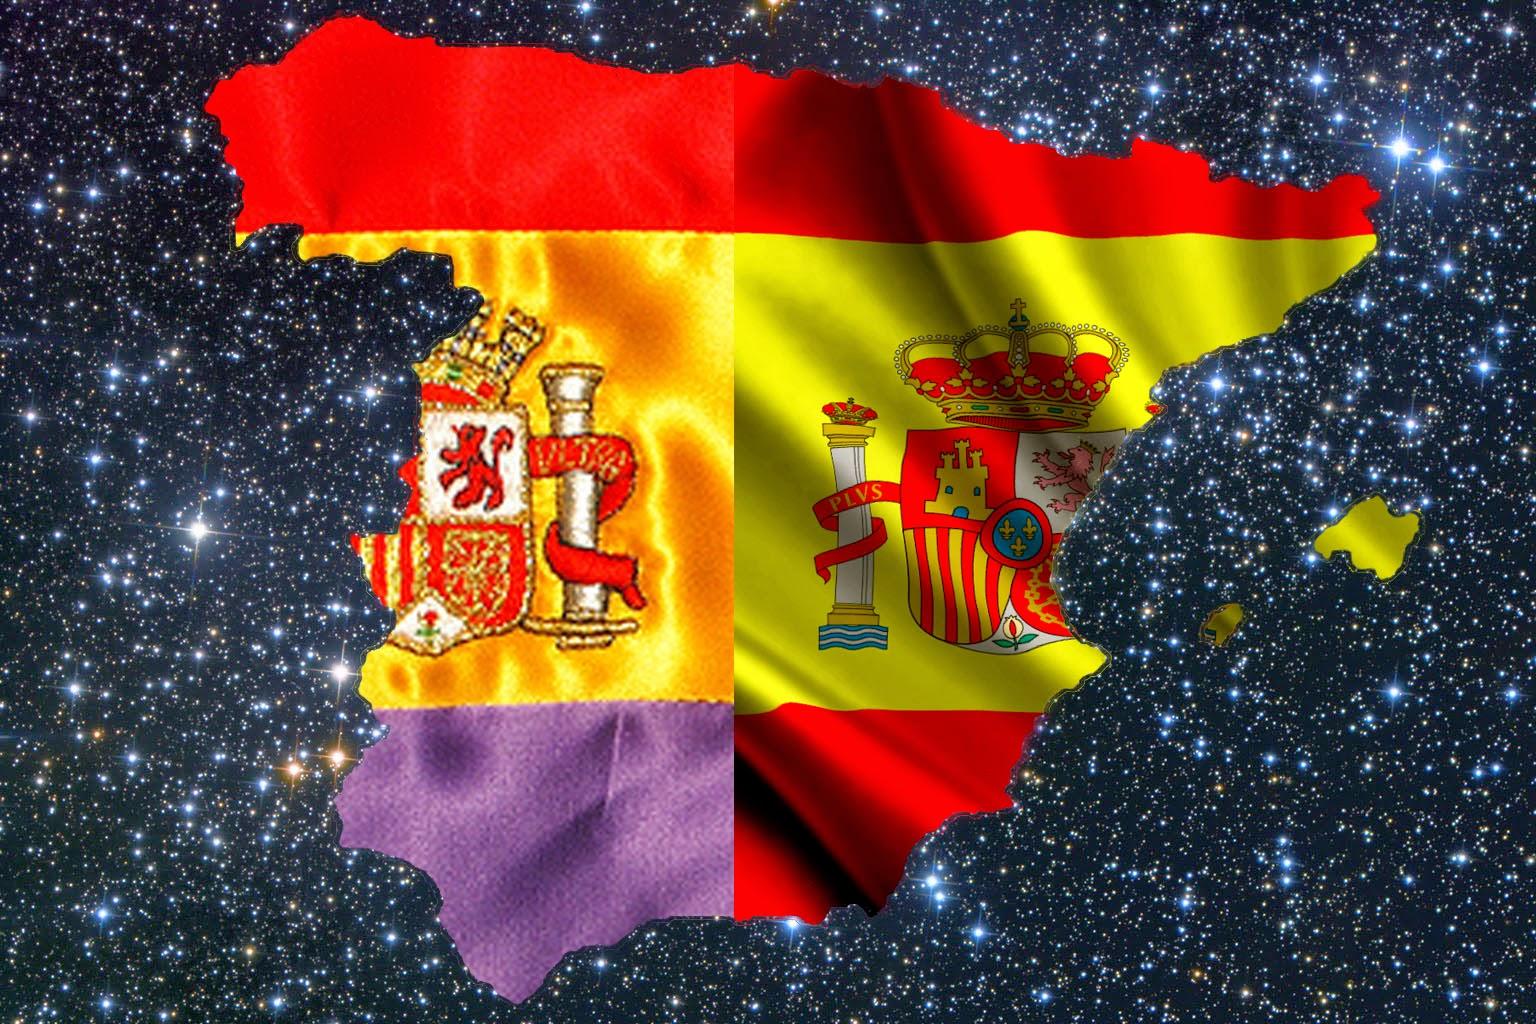 El dilema español